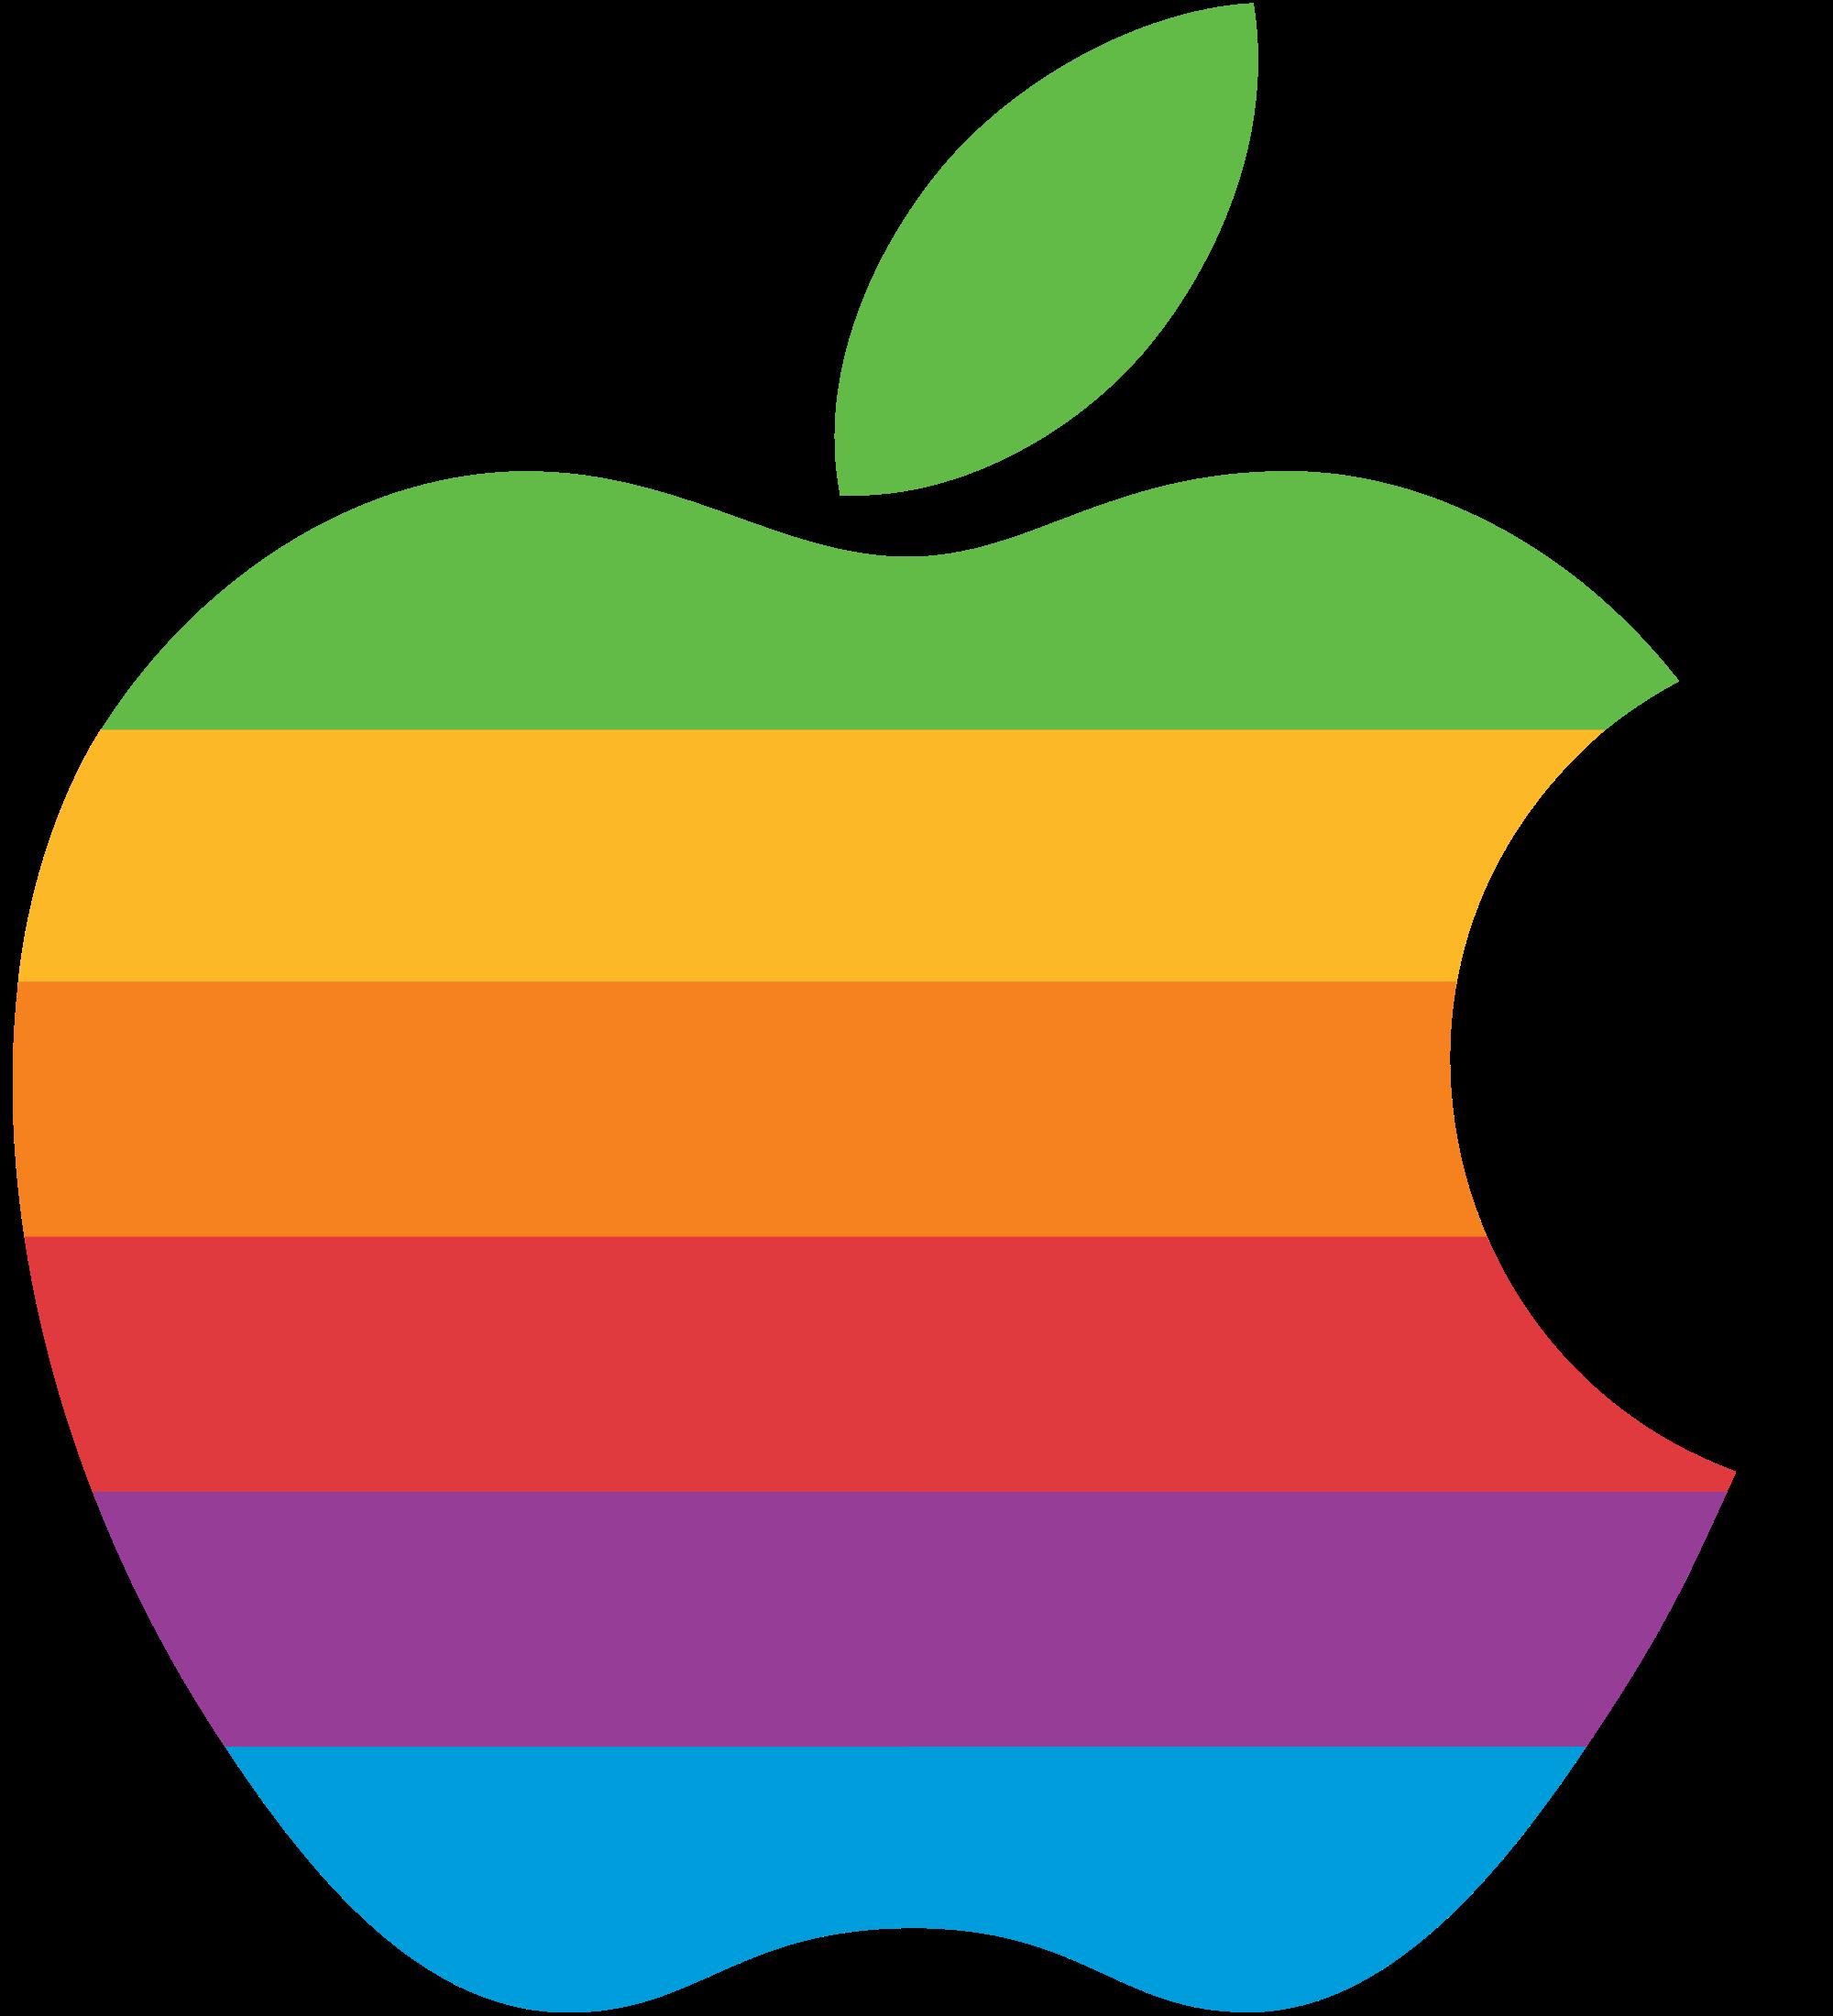 Apple Inc. clipart apple logo #13